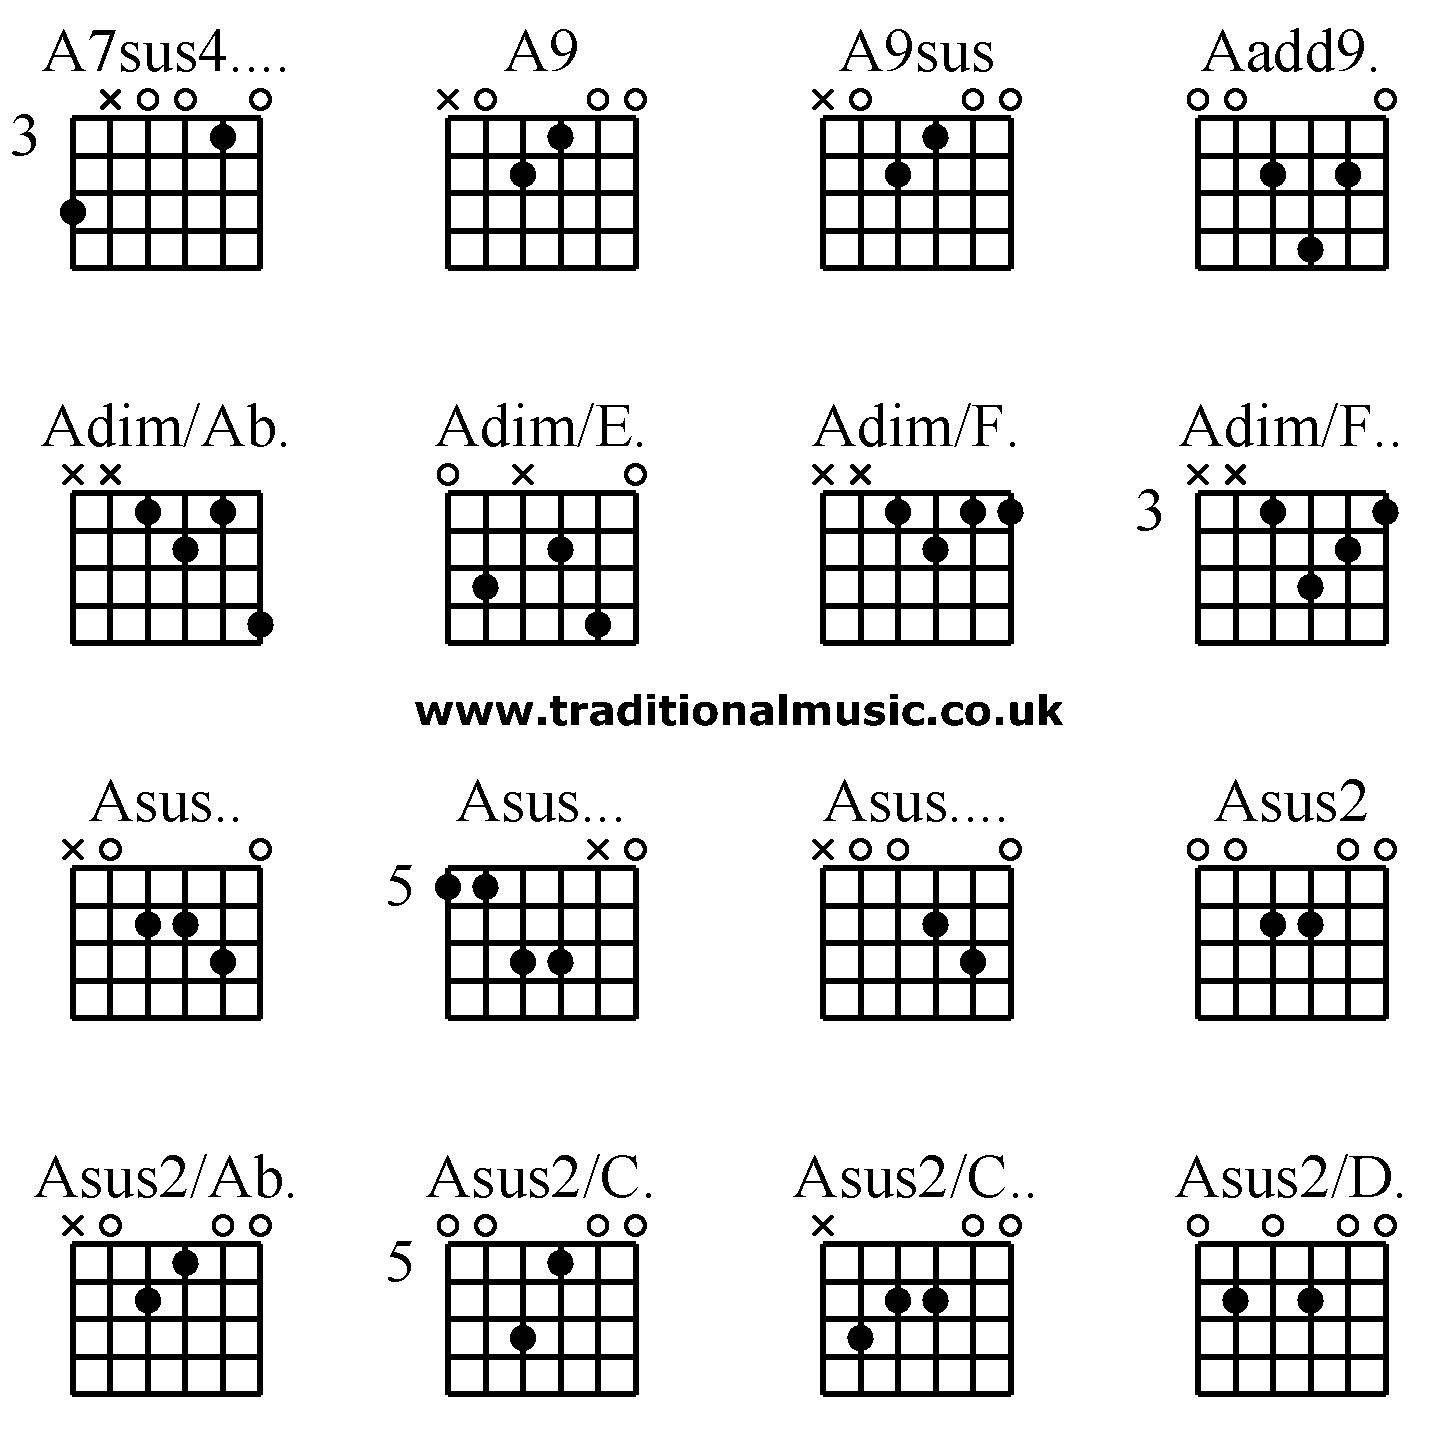 advanced guitar chords a7sus4     a9 a9sus aadd9  adim  ab  adim  e  adim  f  adim  f   asus   asus